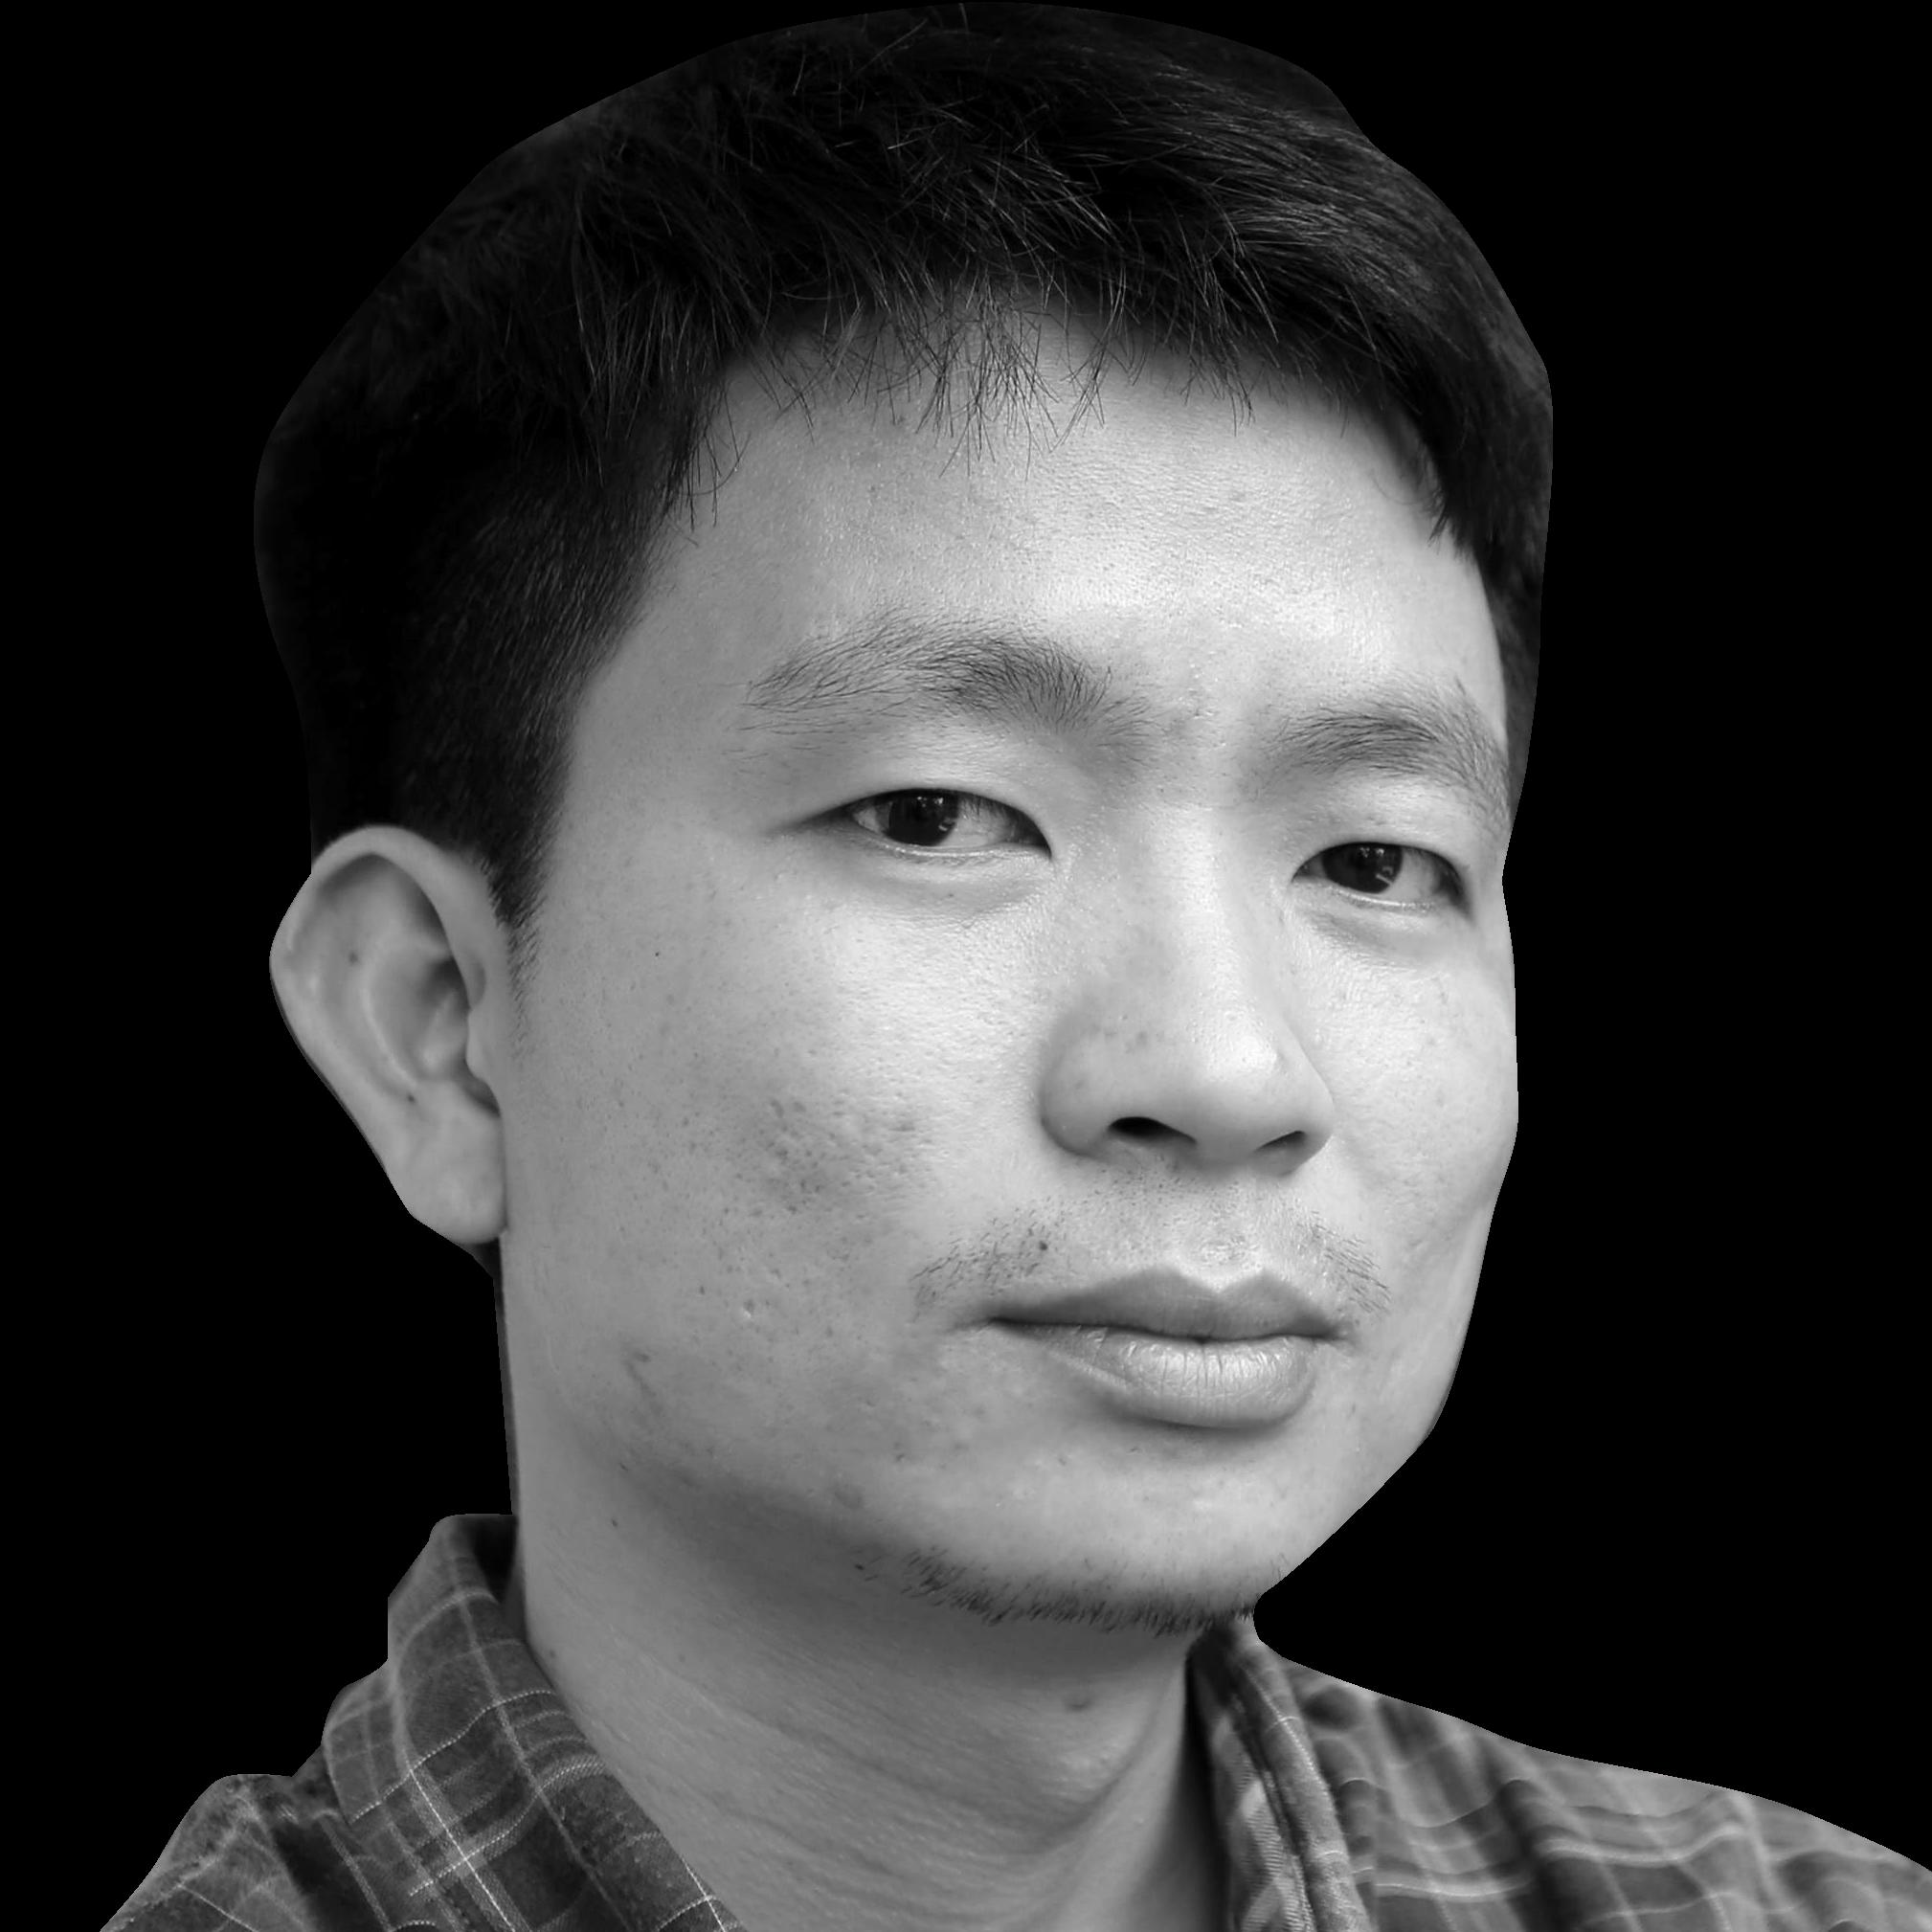 Nguyễn Hải